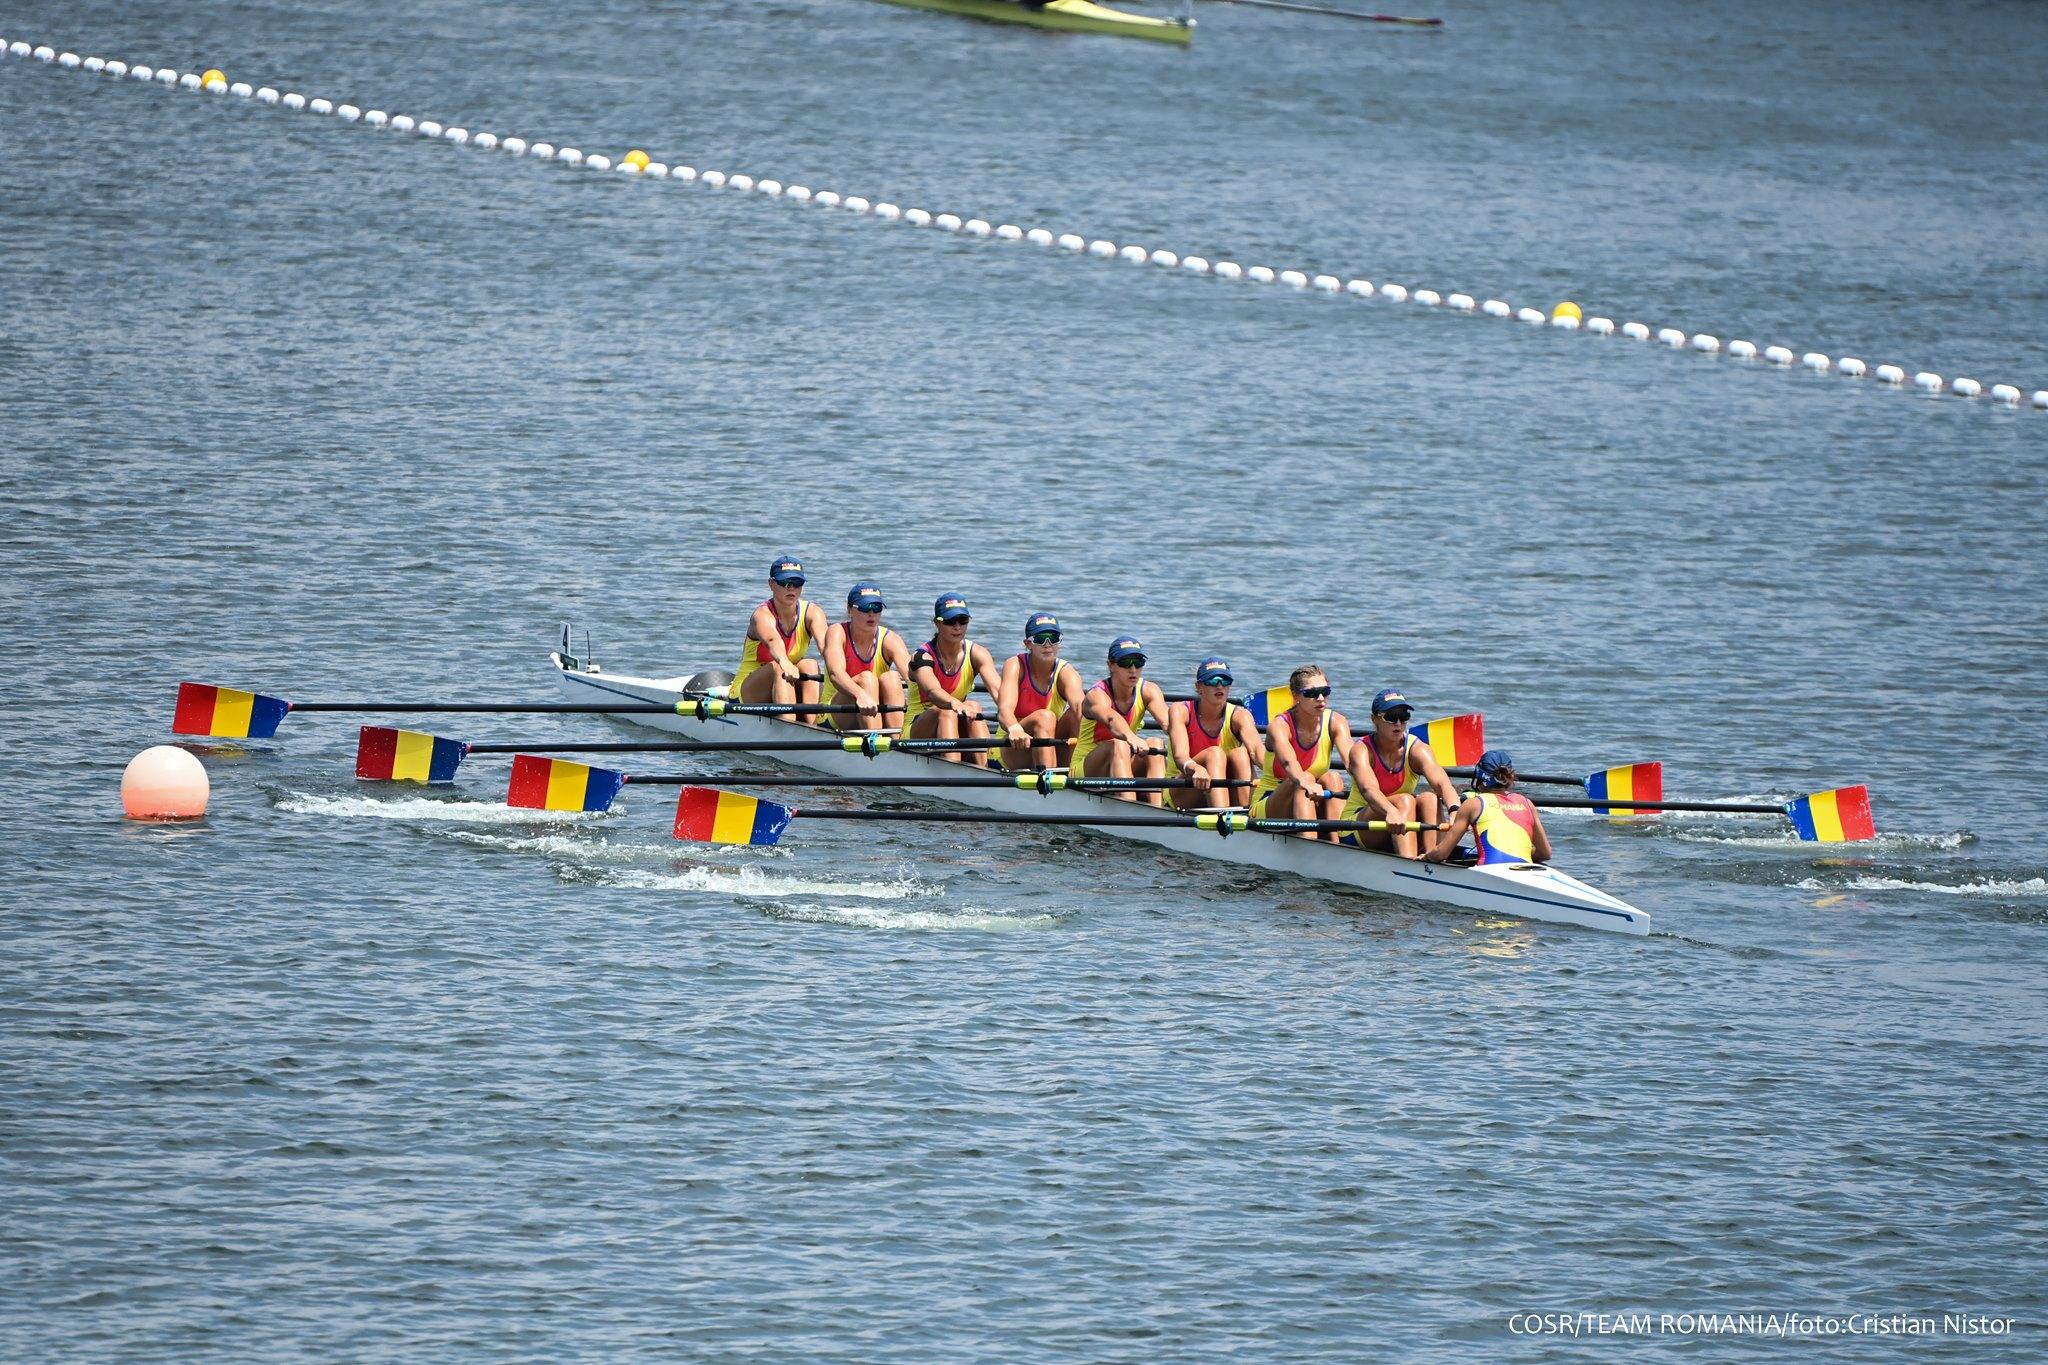 Recordul stabilit la JO de echipajul feminin de 8+1 al României, omologat de Guinness World Records